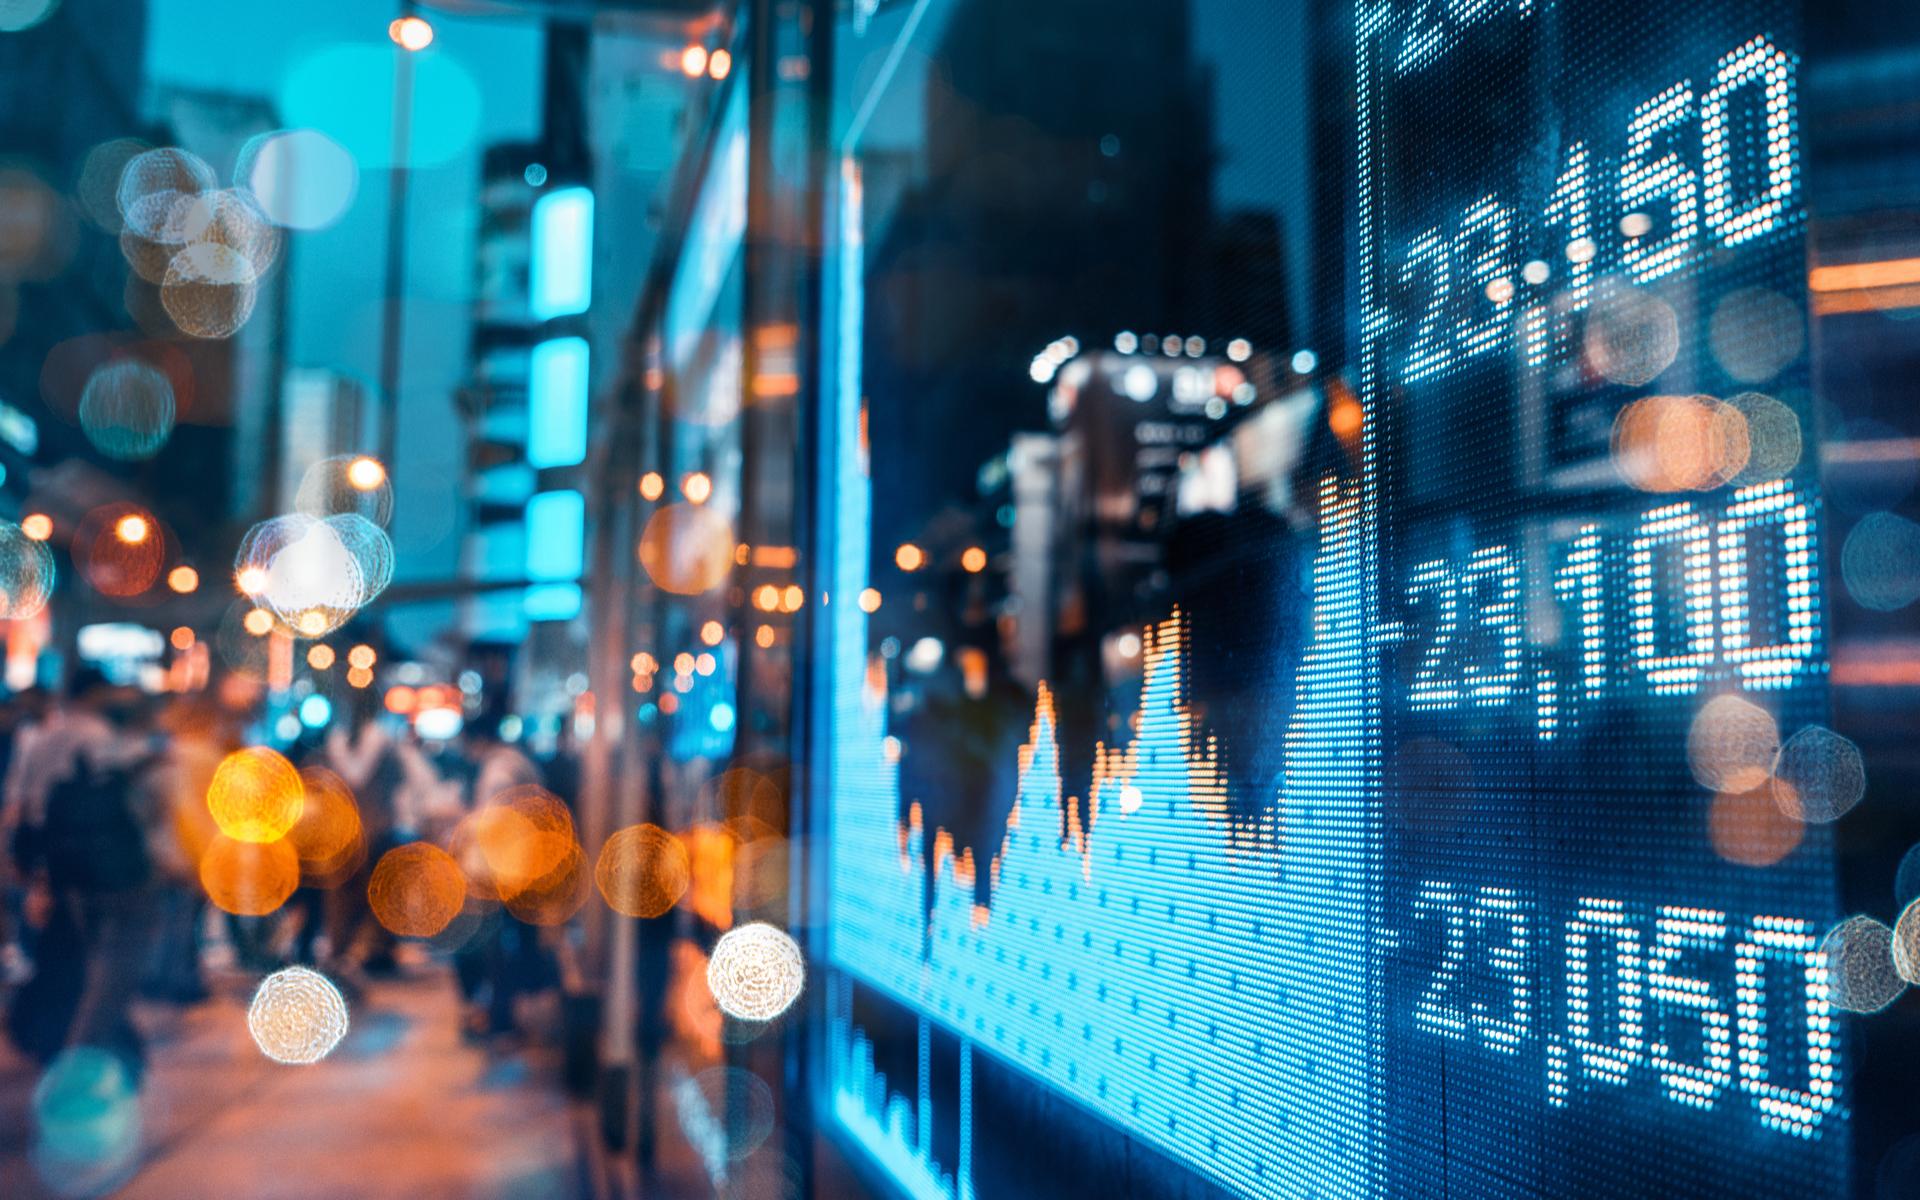 stock market quotes bitcoin